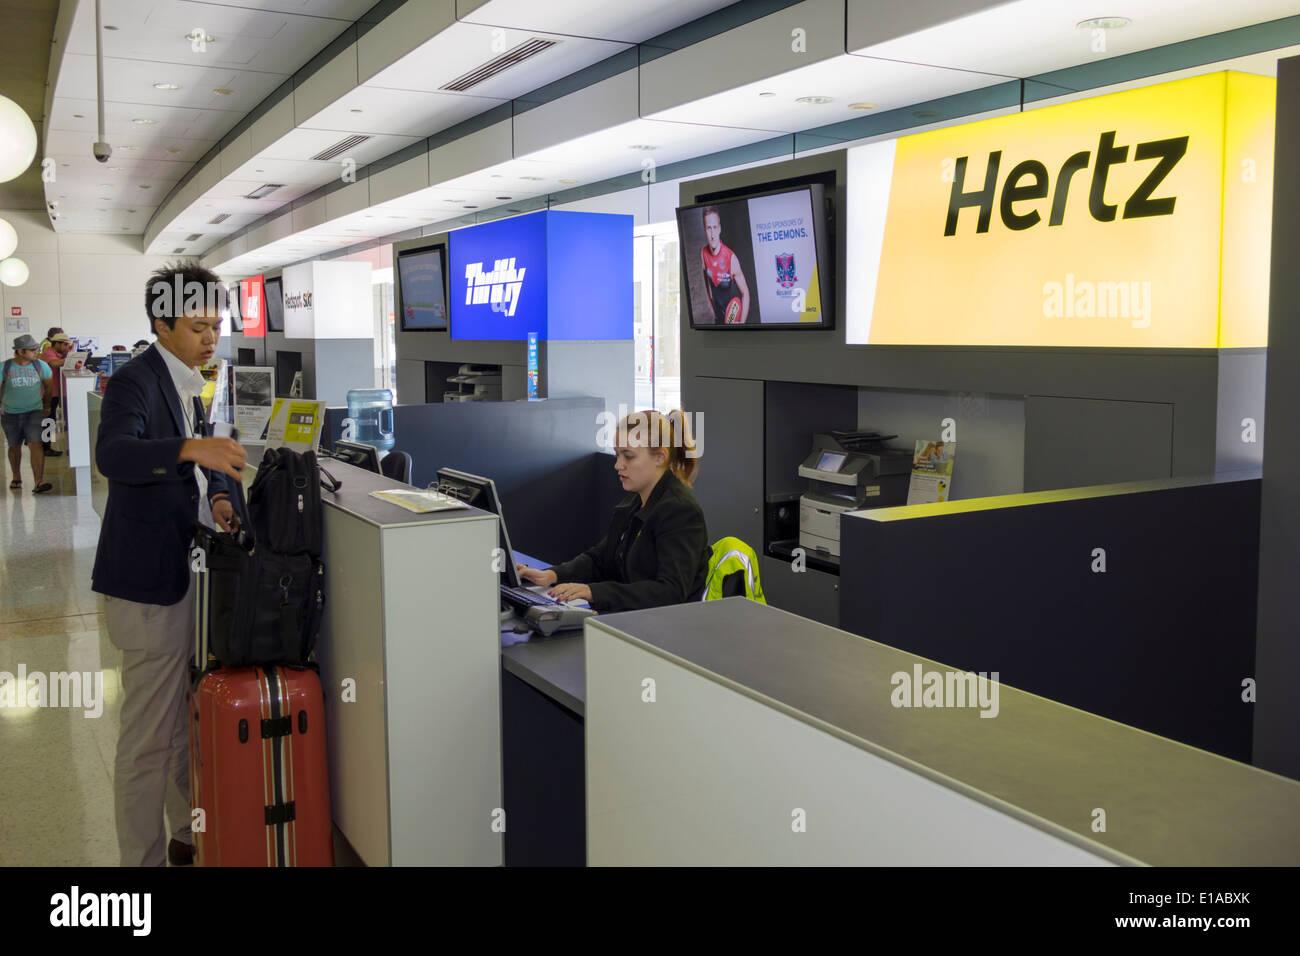 Thrifty Car Rental In Brisbane Airport